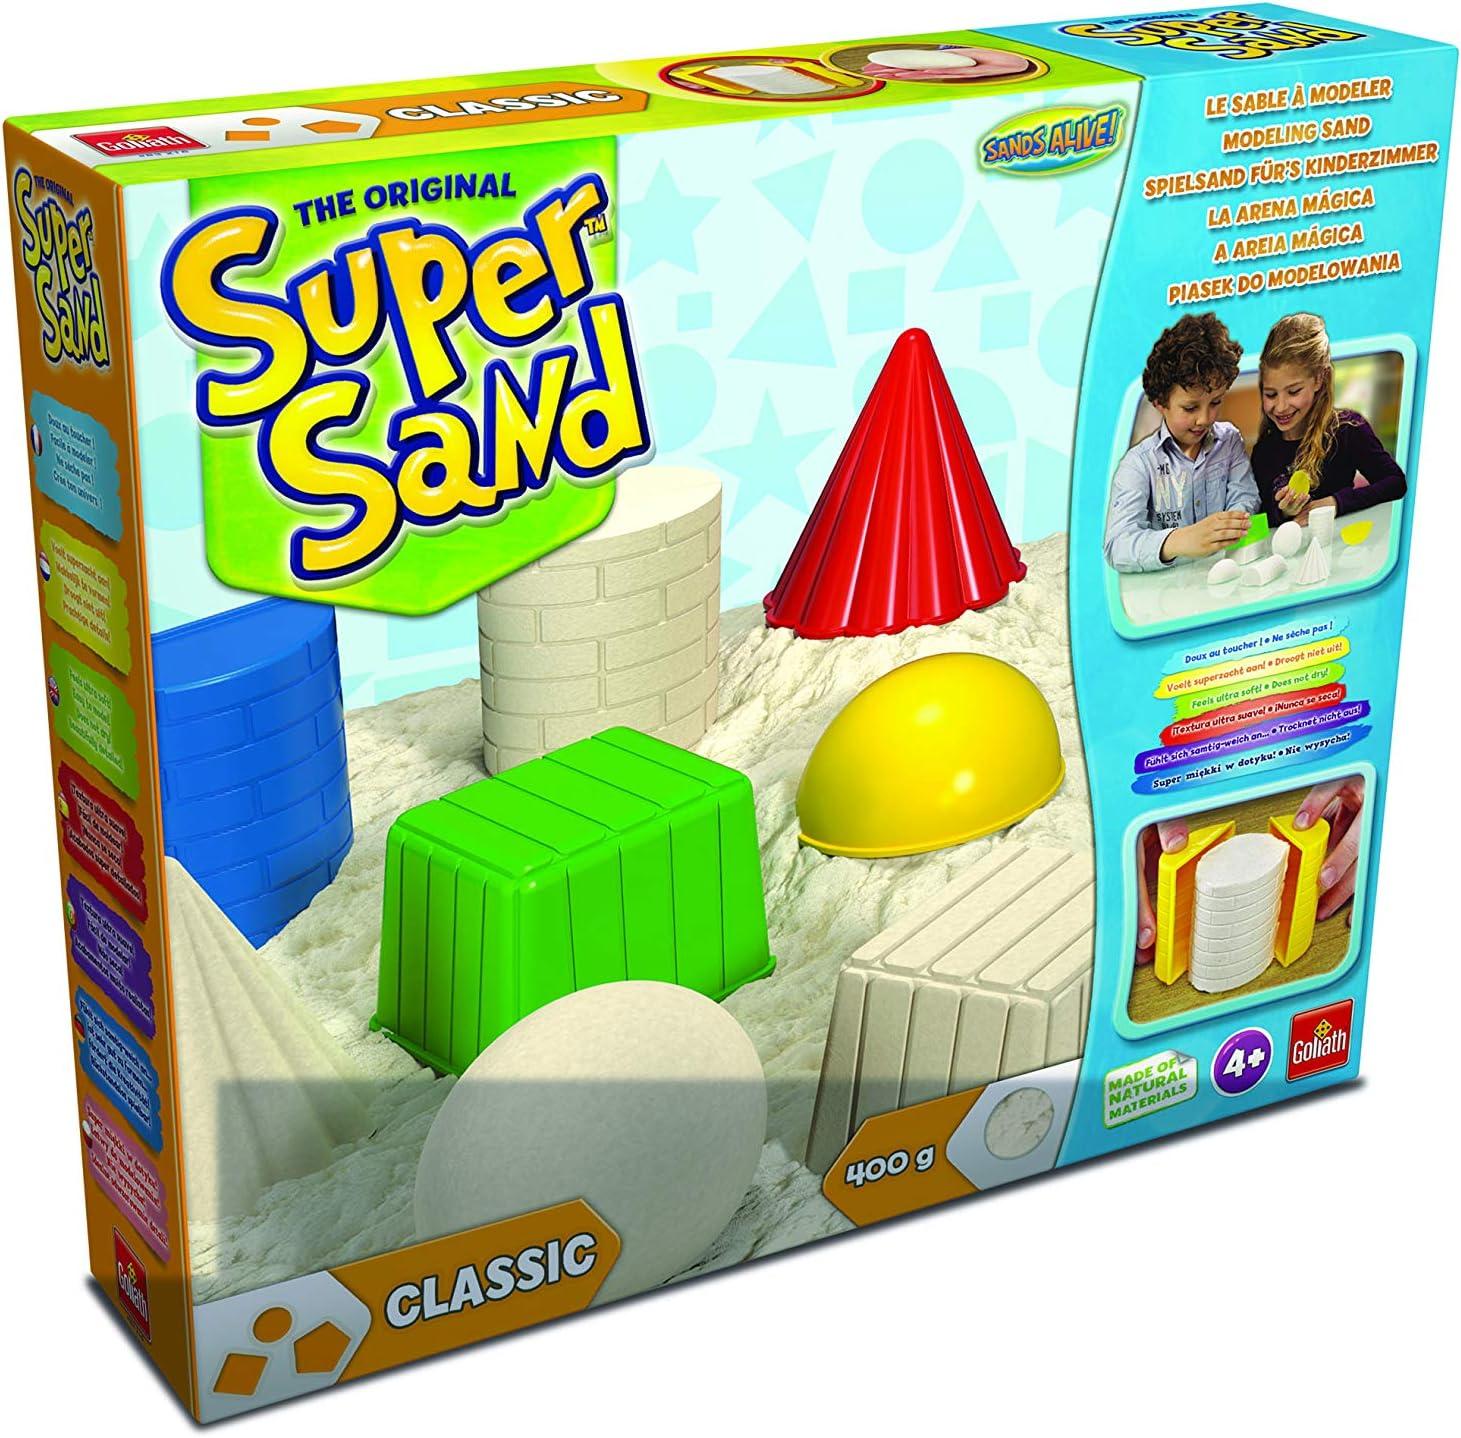 Super Sand Classic Arena Mágica, Color Natural, 32.3 x 26.9 x 6.3 (Goliath 83216)